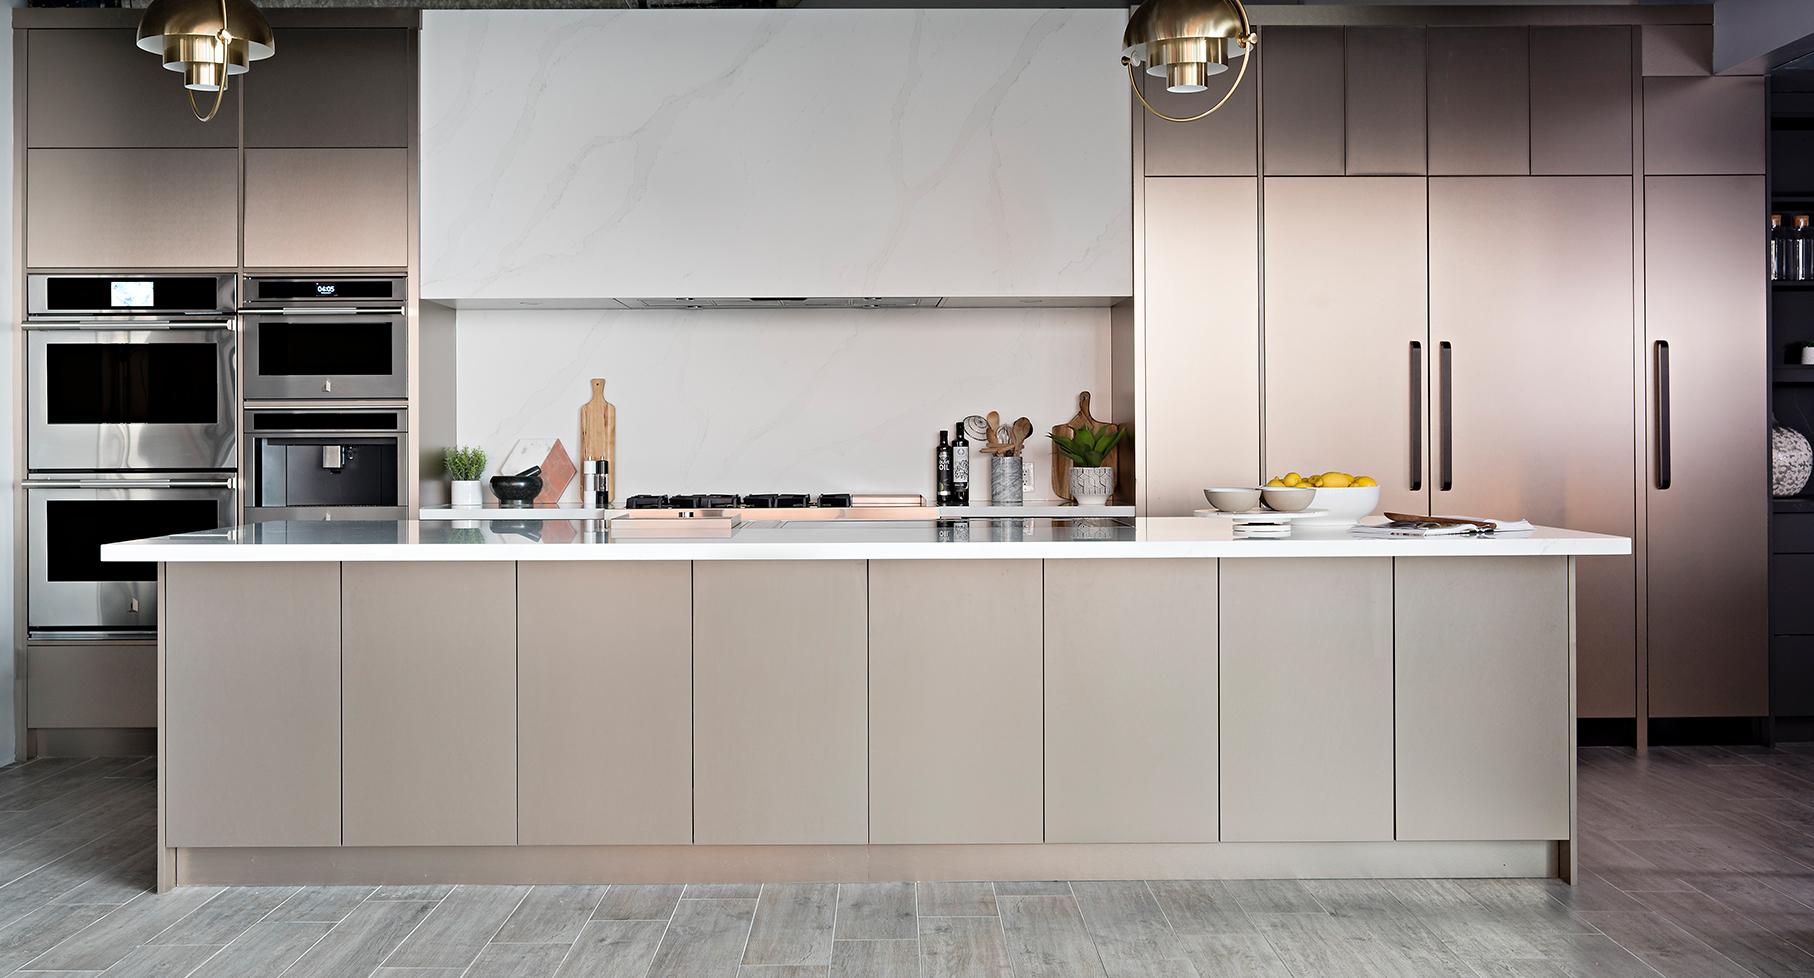 full jenn-air kitchen image of integrated fridge, wall ovens, coffee machine and range